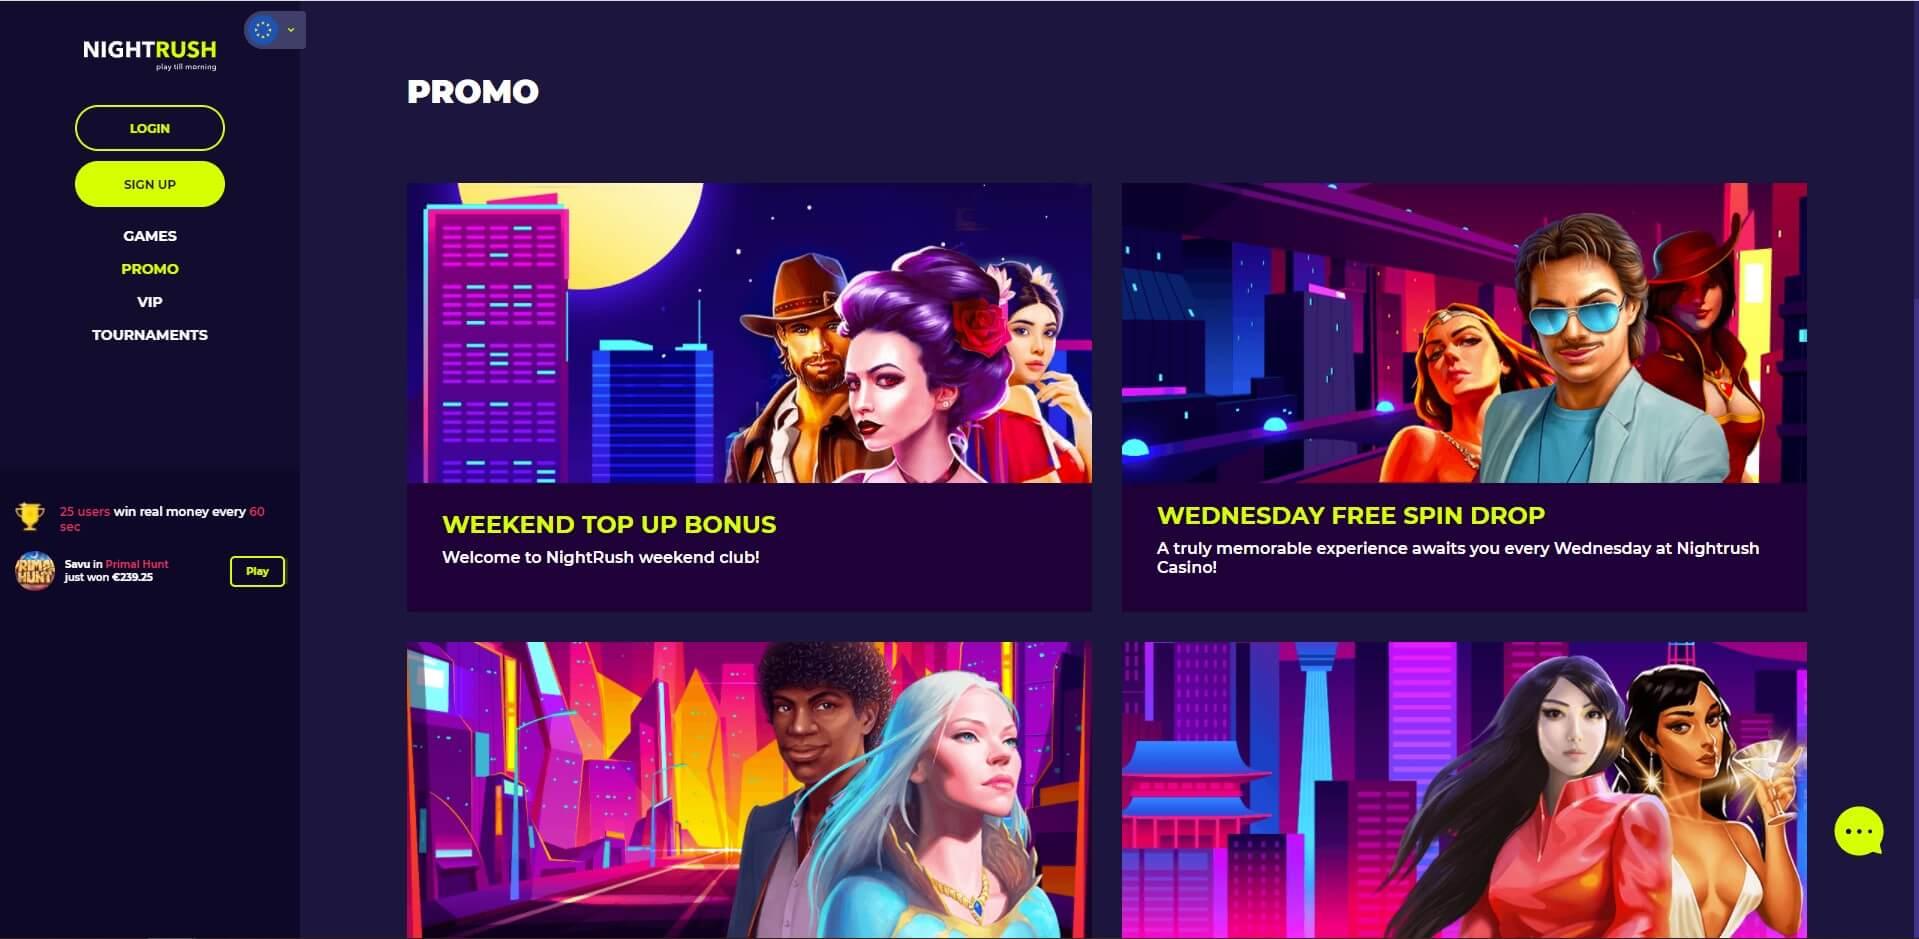 Promotions at NightRush Casino